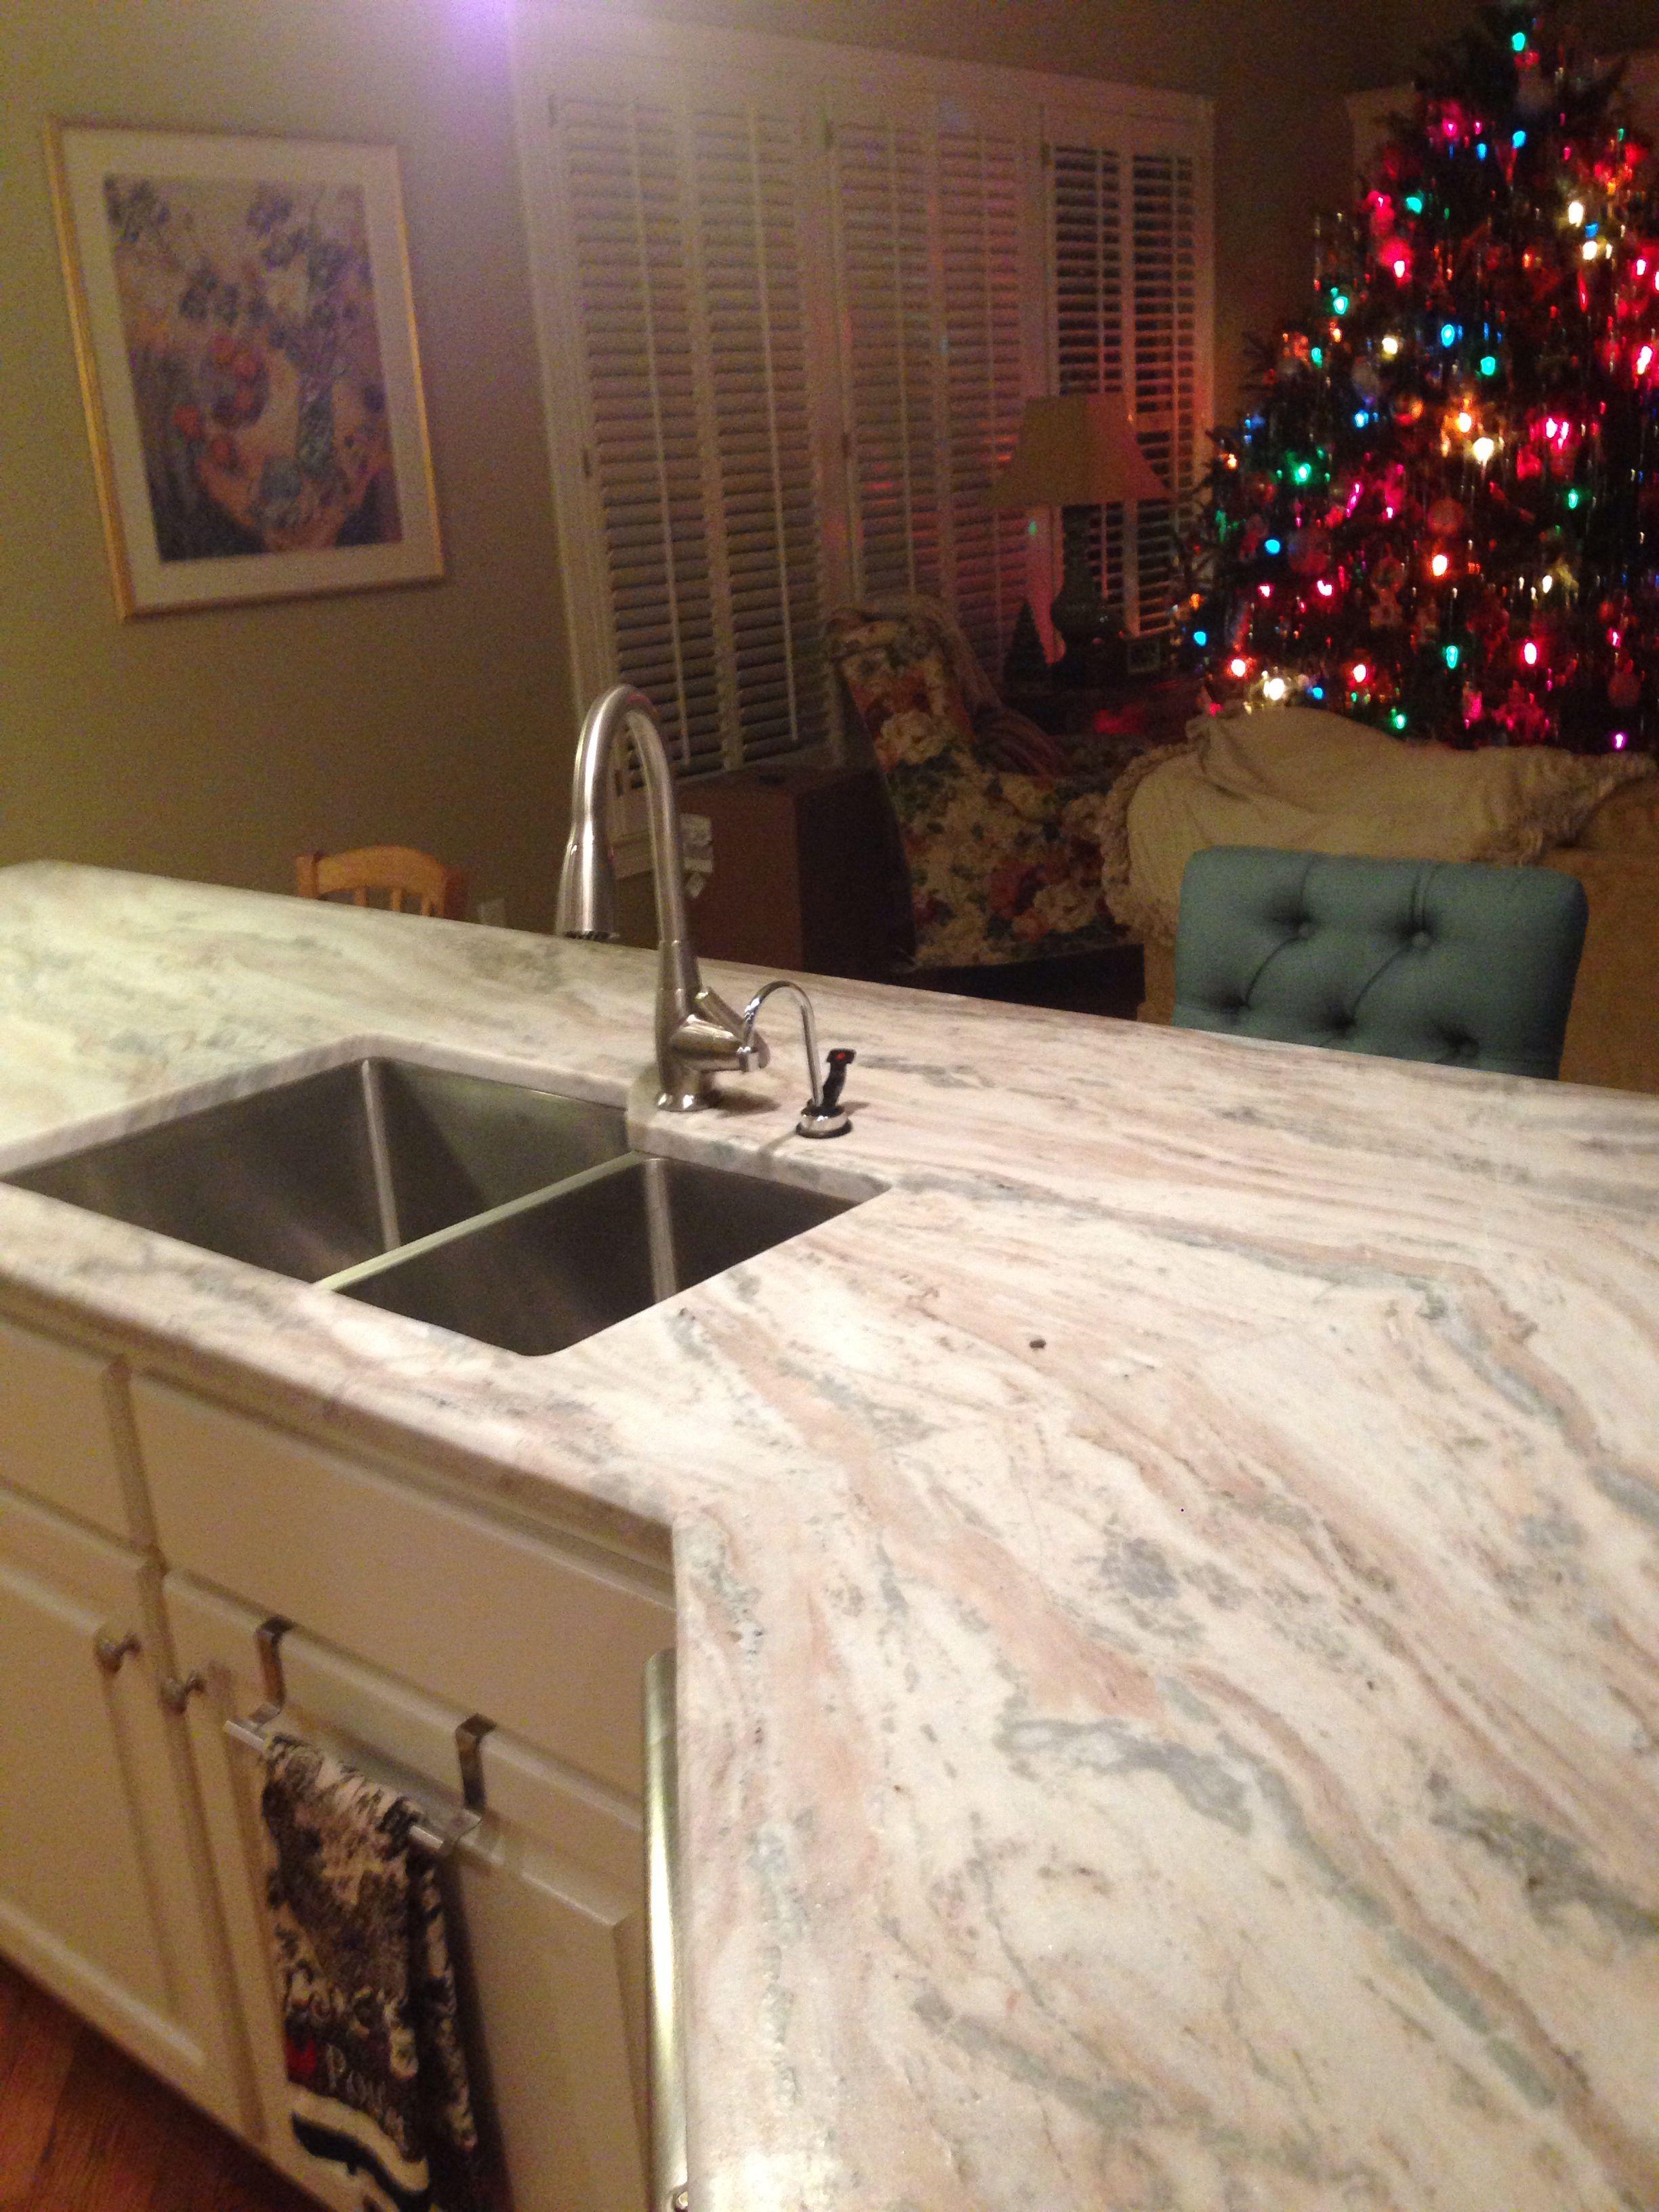 Fantasy Brown Granite In Kitchen For The Home Pinterest Brown Granite Granite And Kitchens